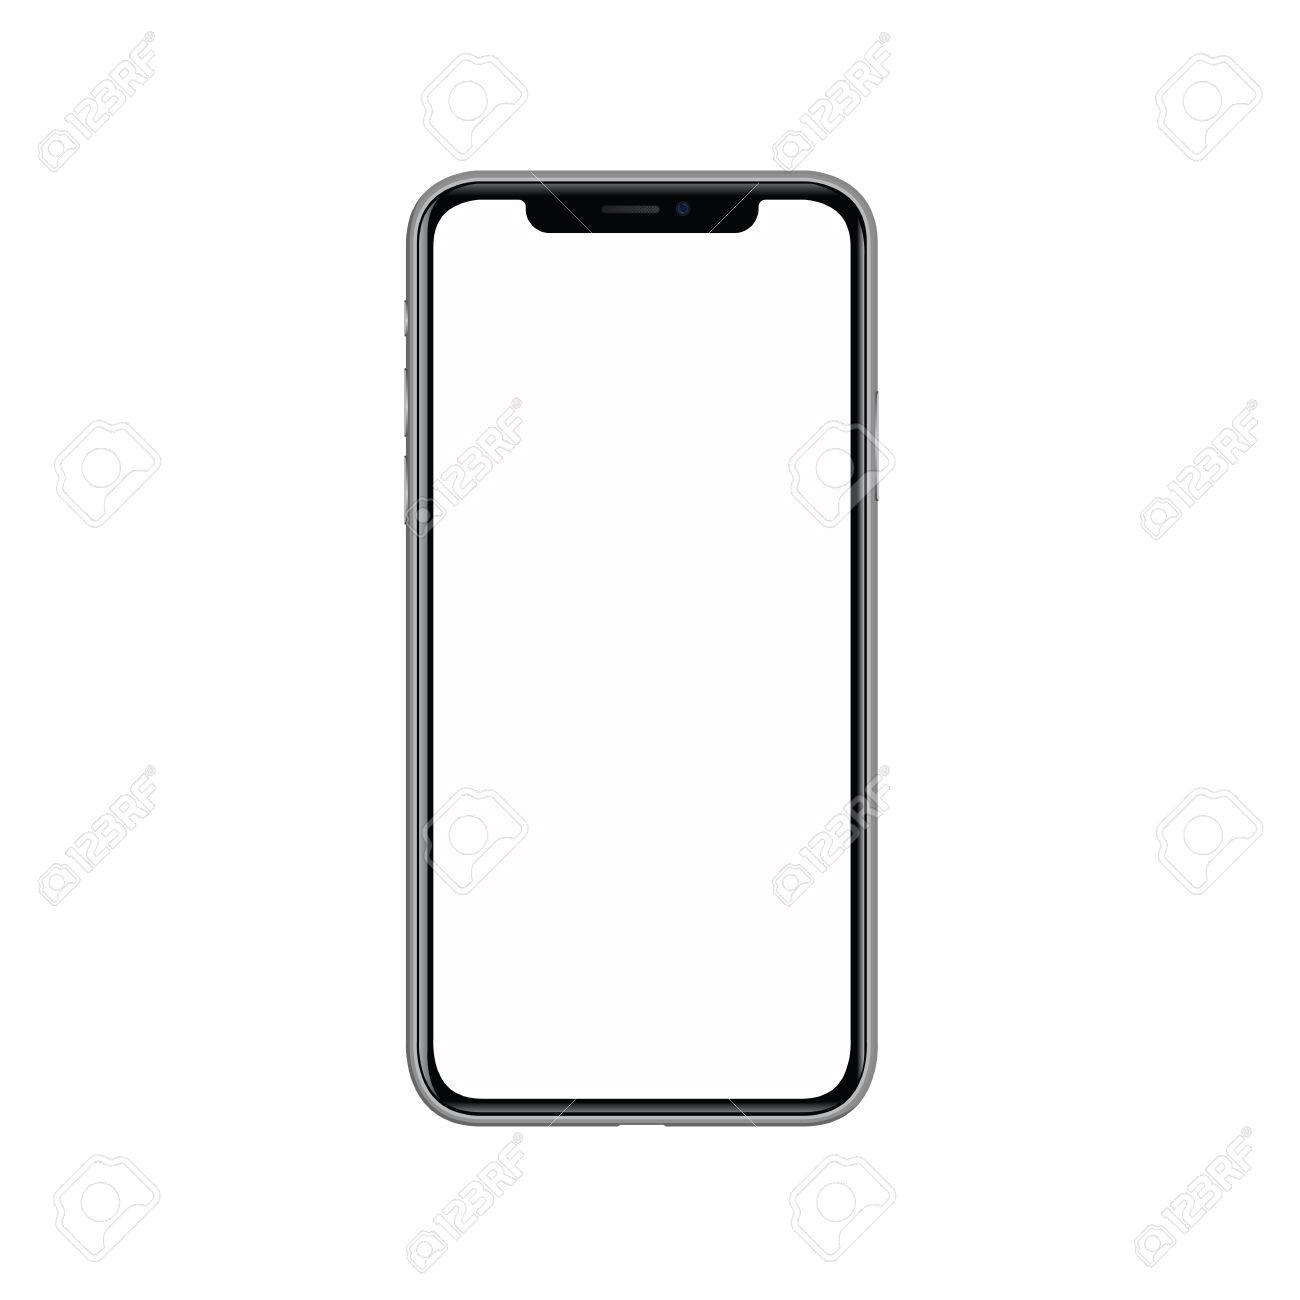 Iphone 空白の画面で x。白い背景上に分離。現実的な